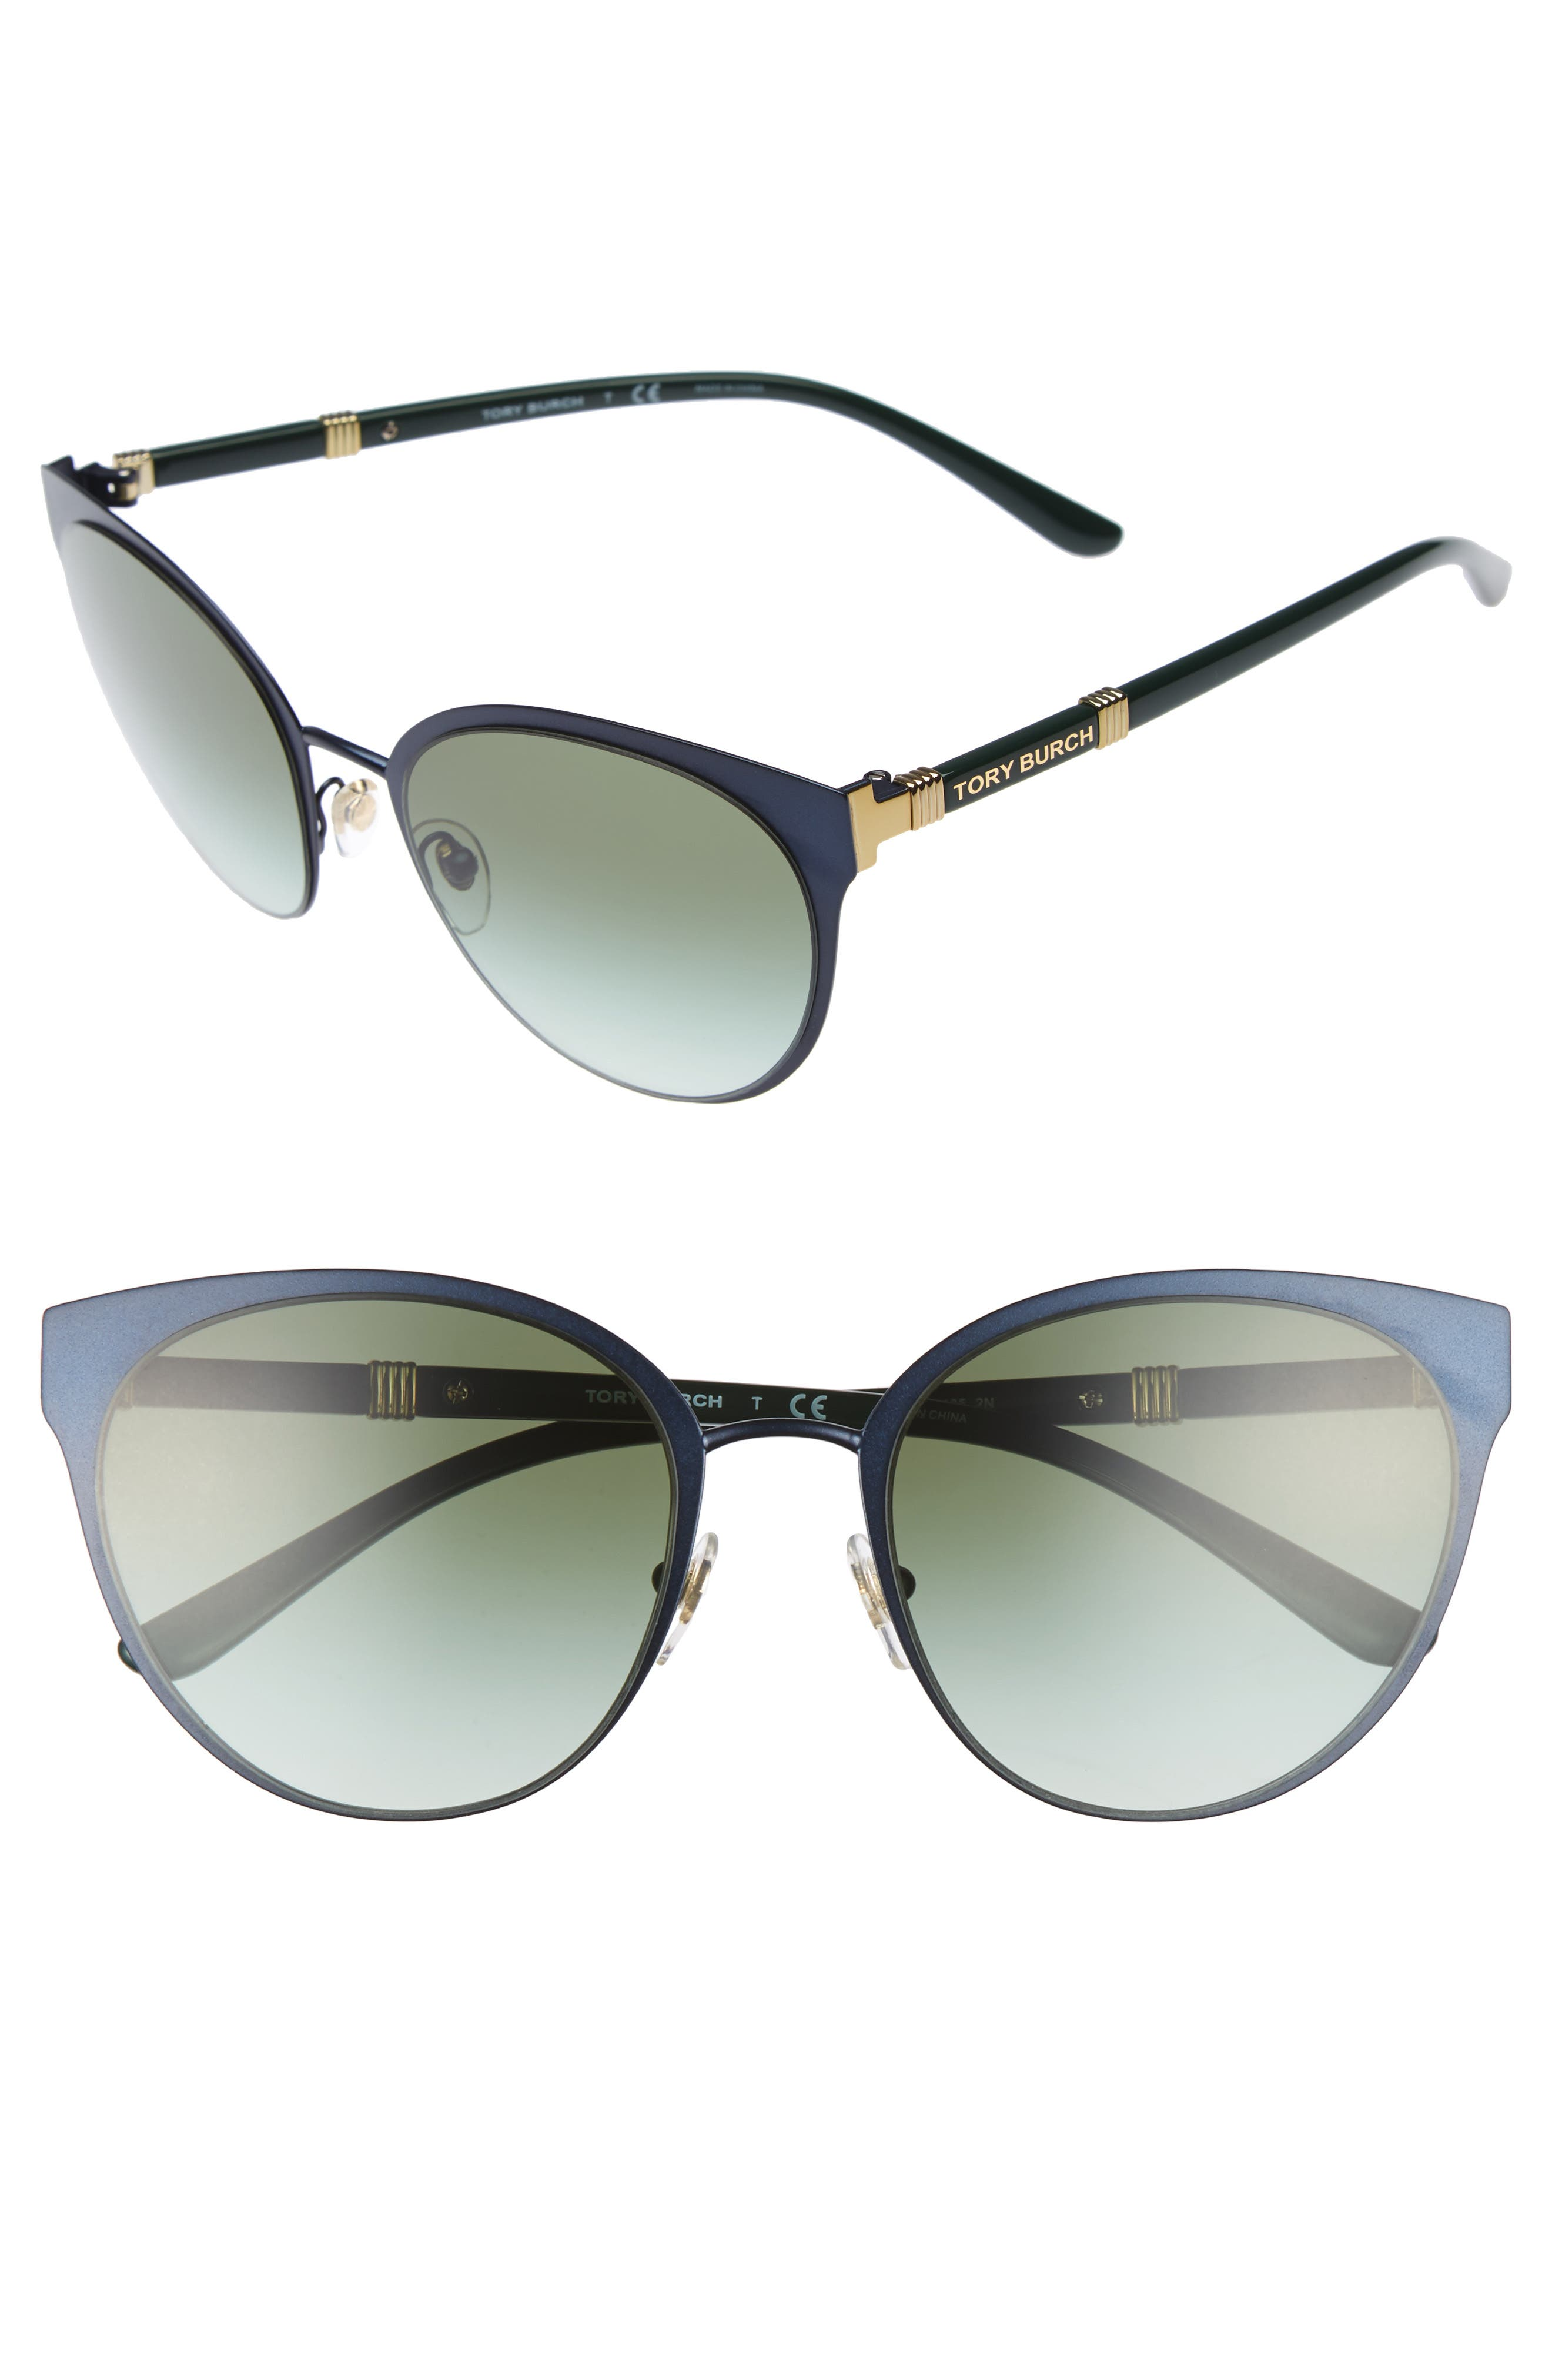 Tory Burch 55mm Cat Eye Sunglasses